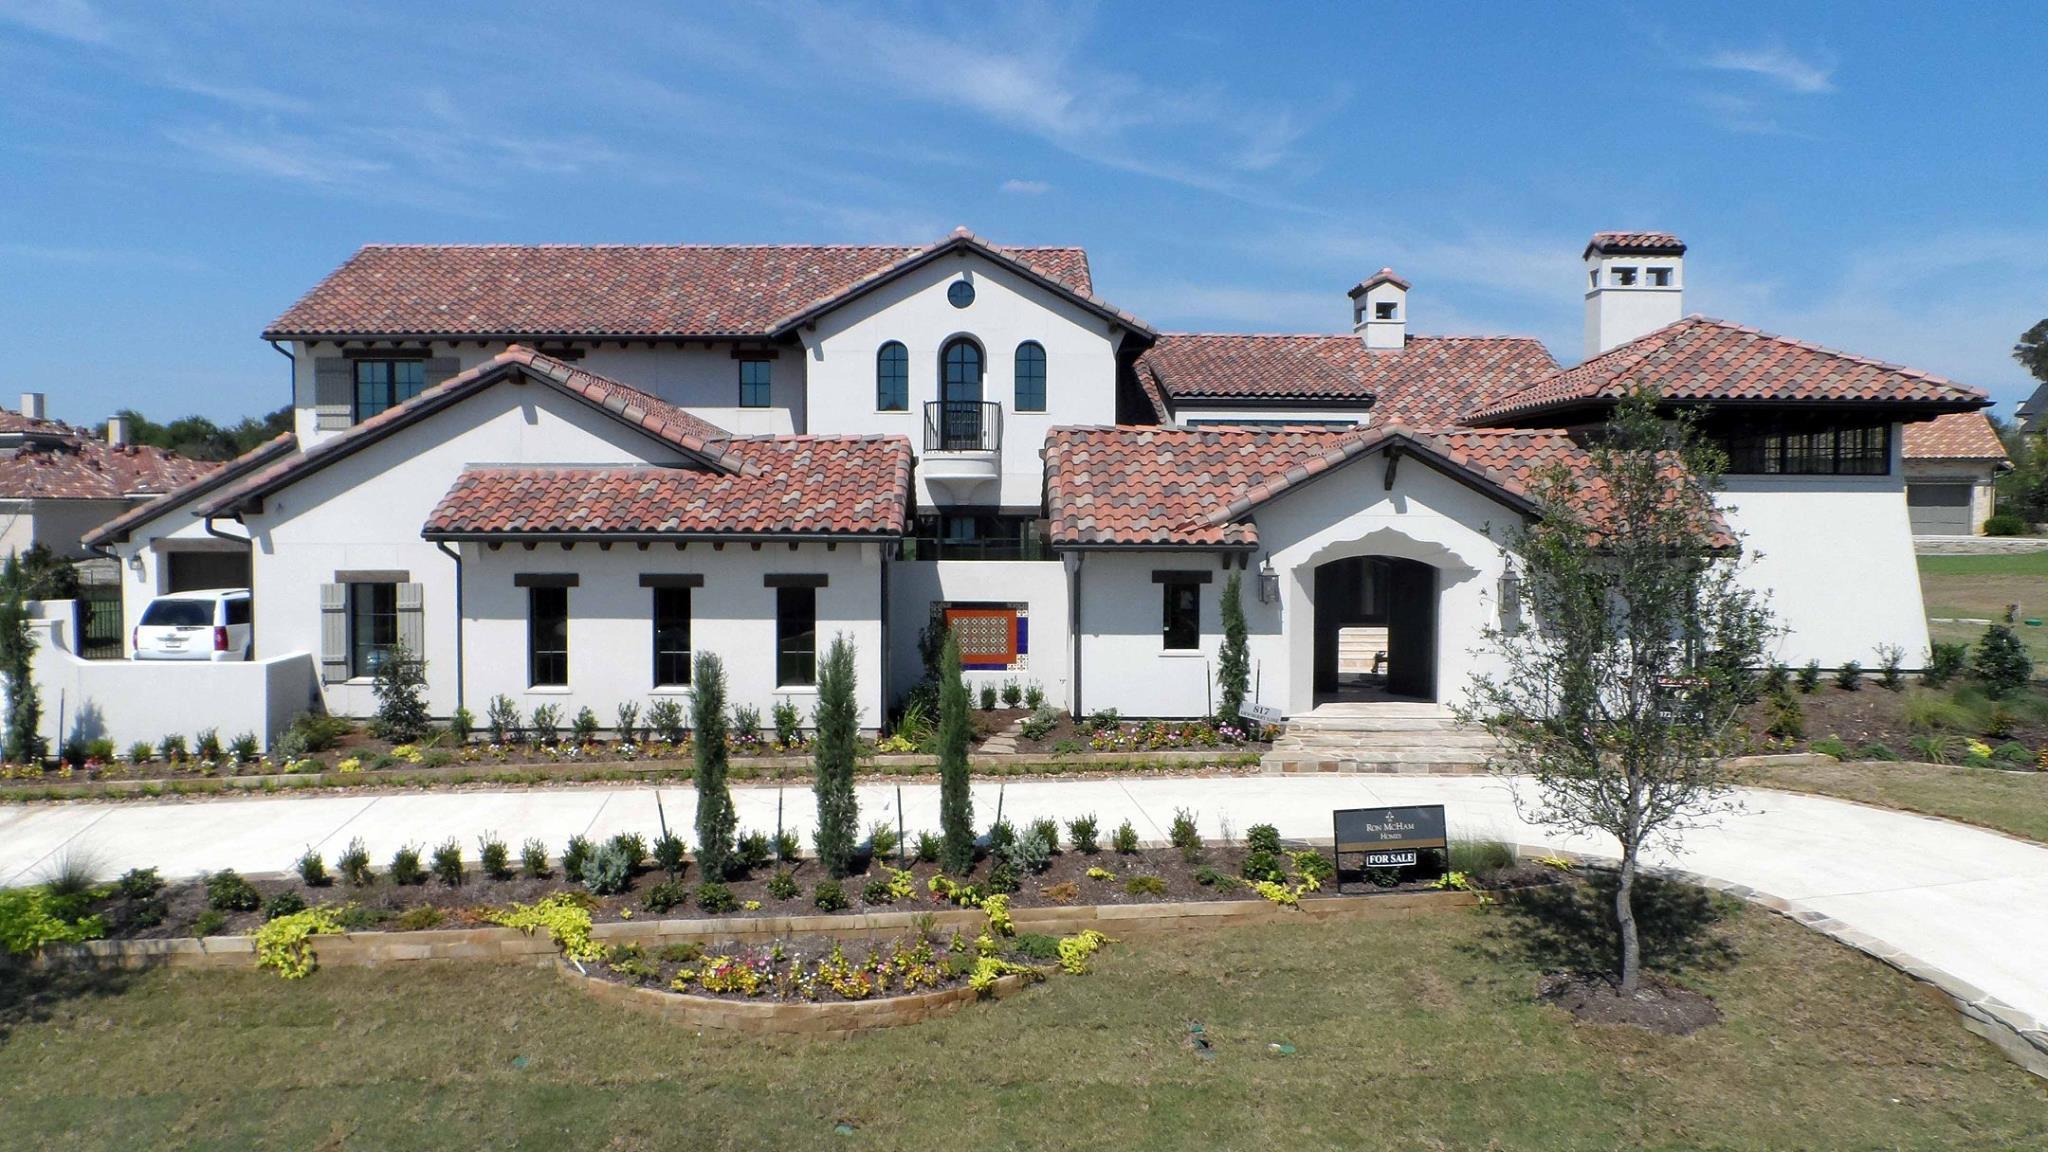 Spanish Revival